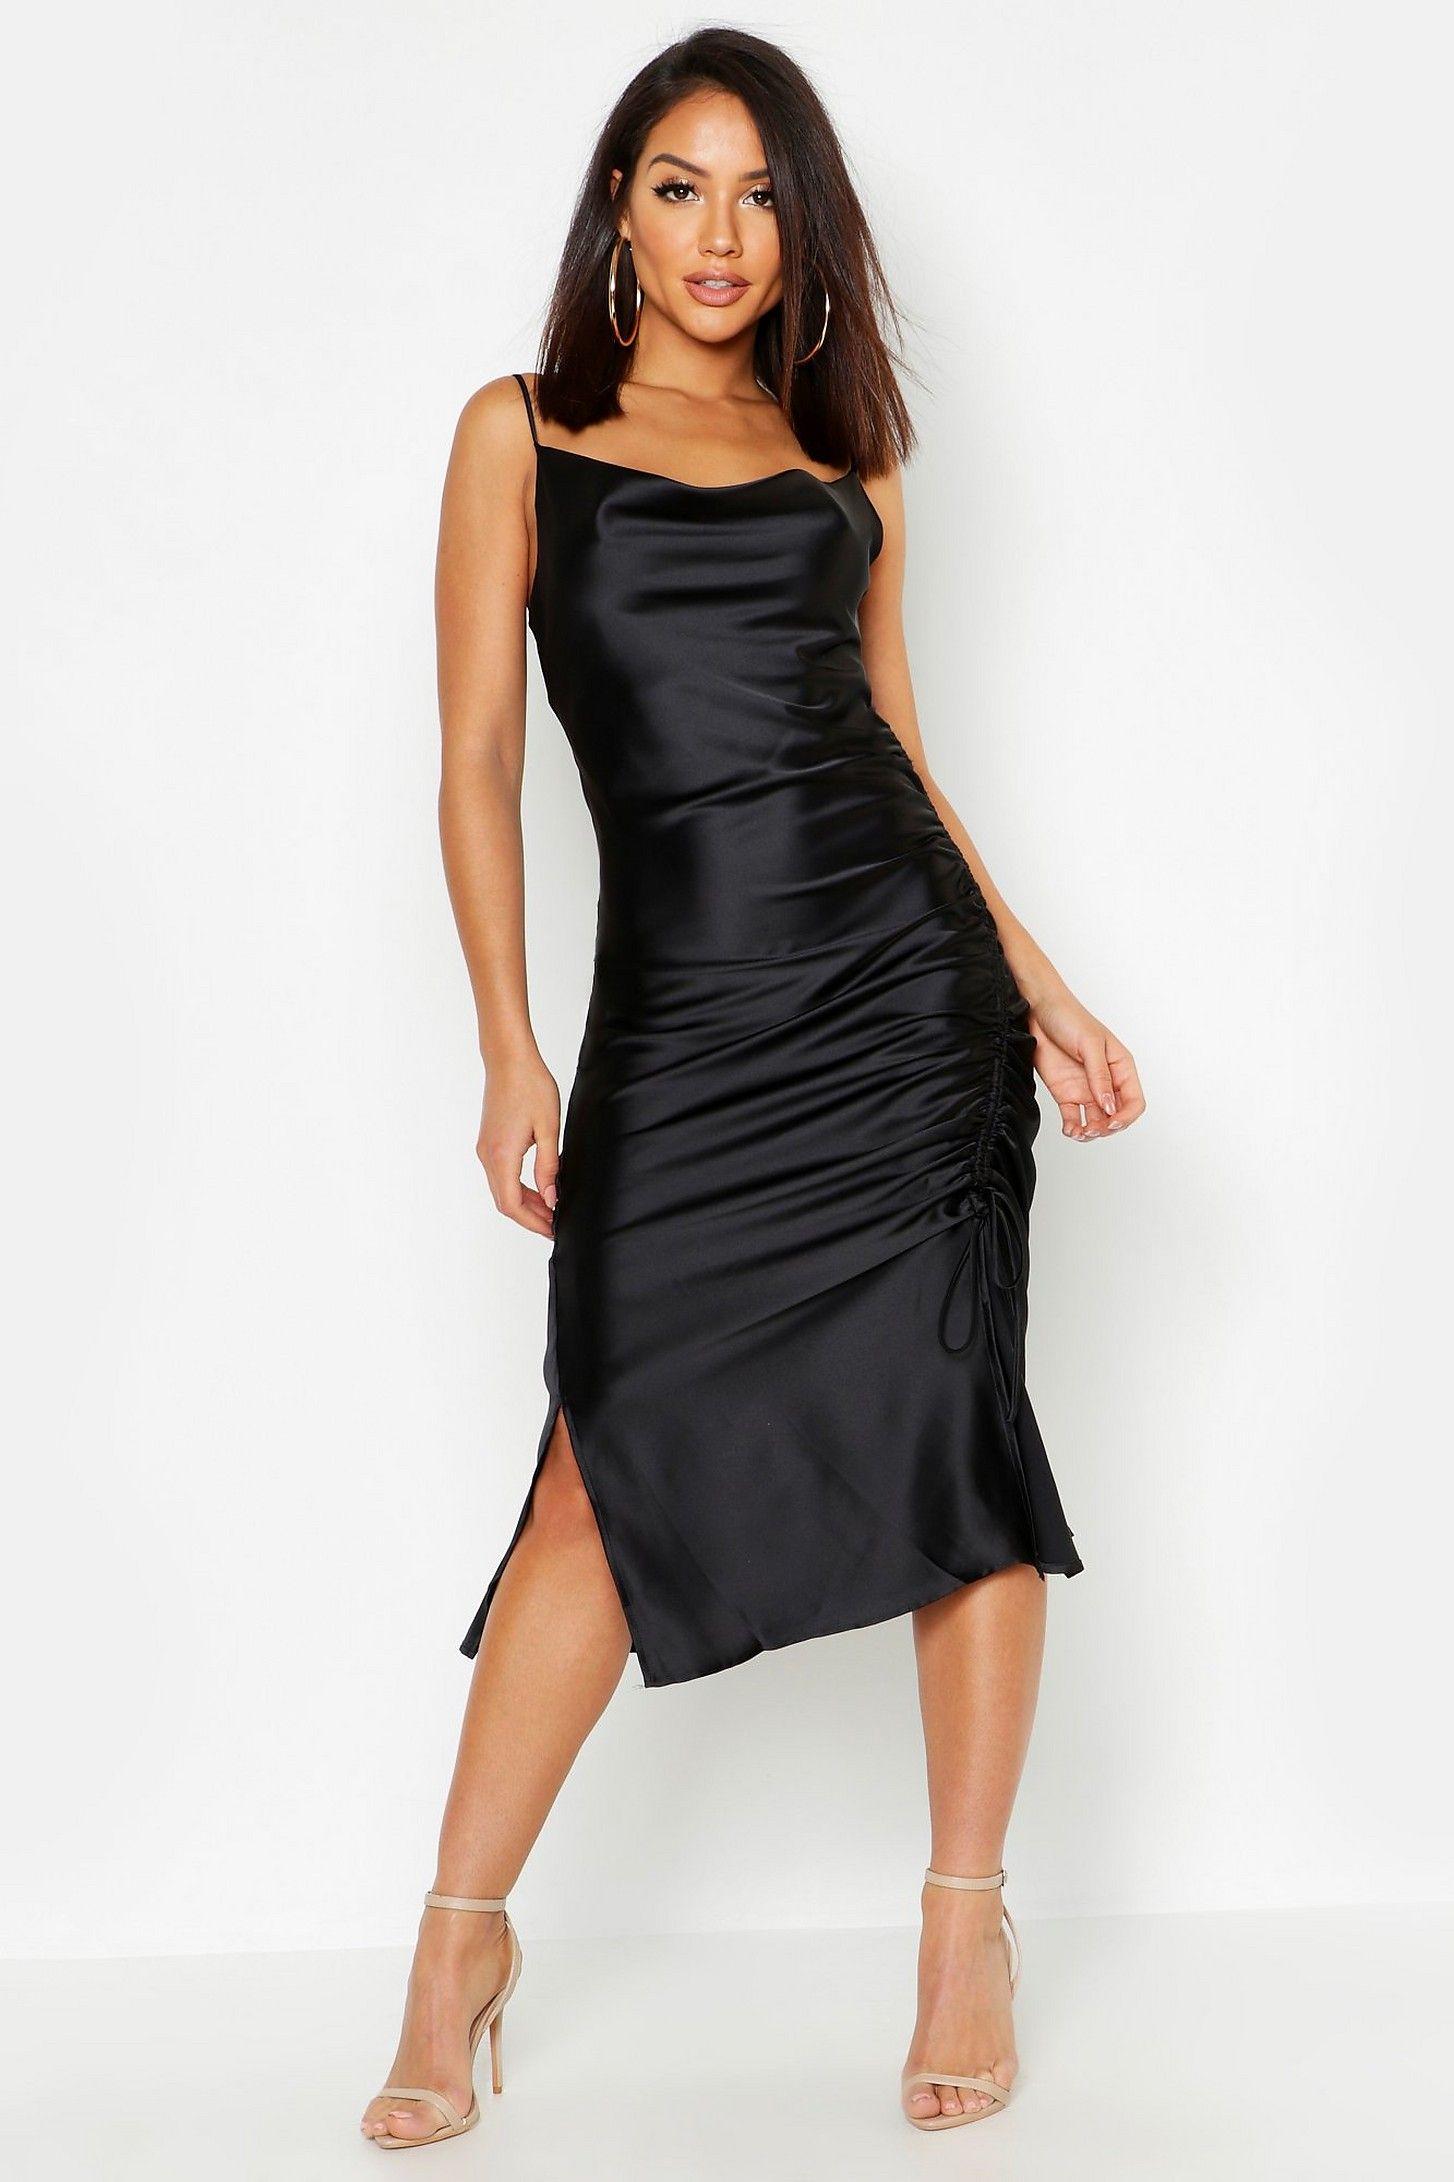 Satin Ruched Side Dress Boohoo In 2019 Dresses Dress